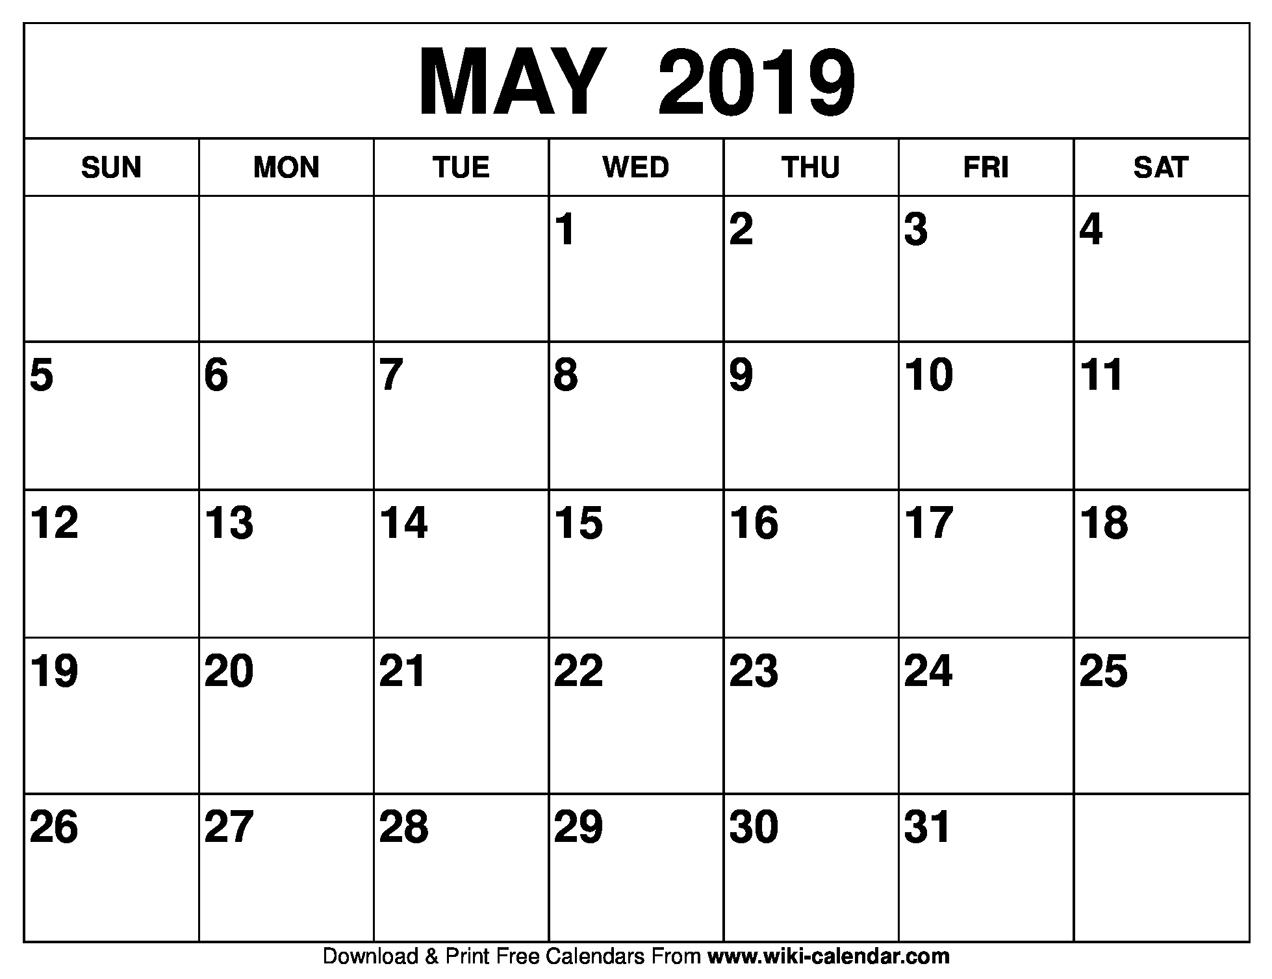 May 2019 Activity Calendar